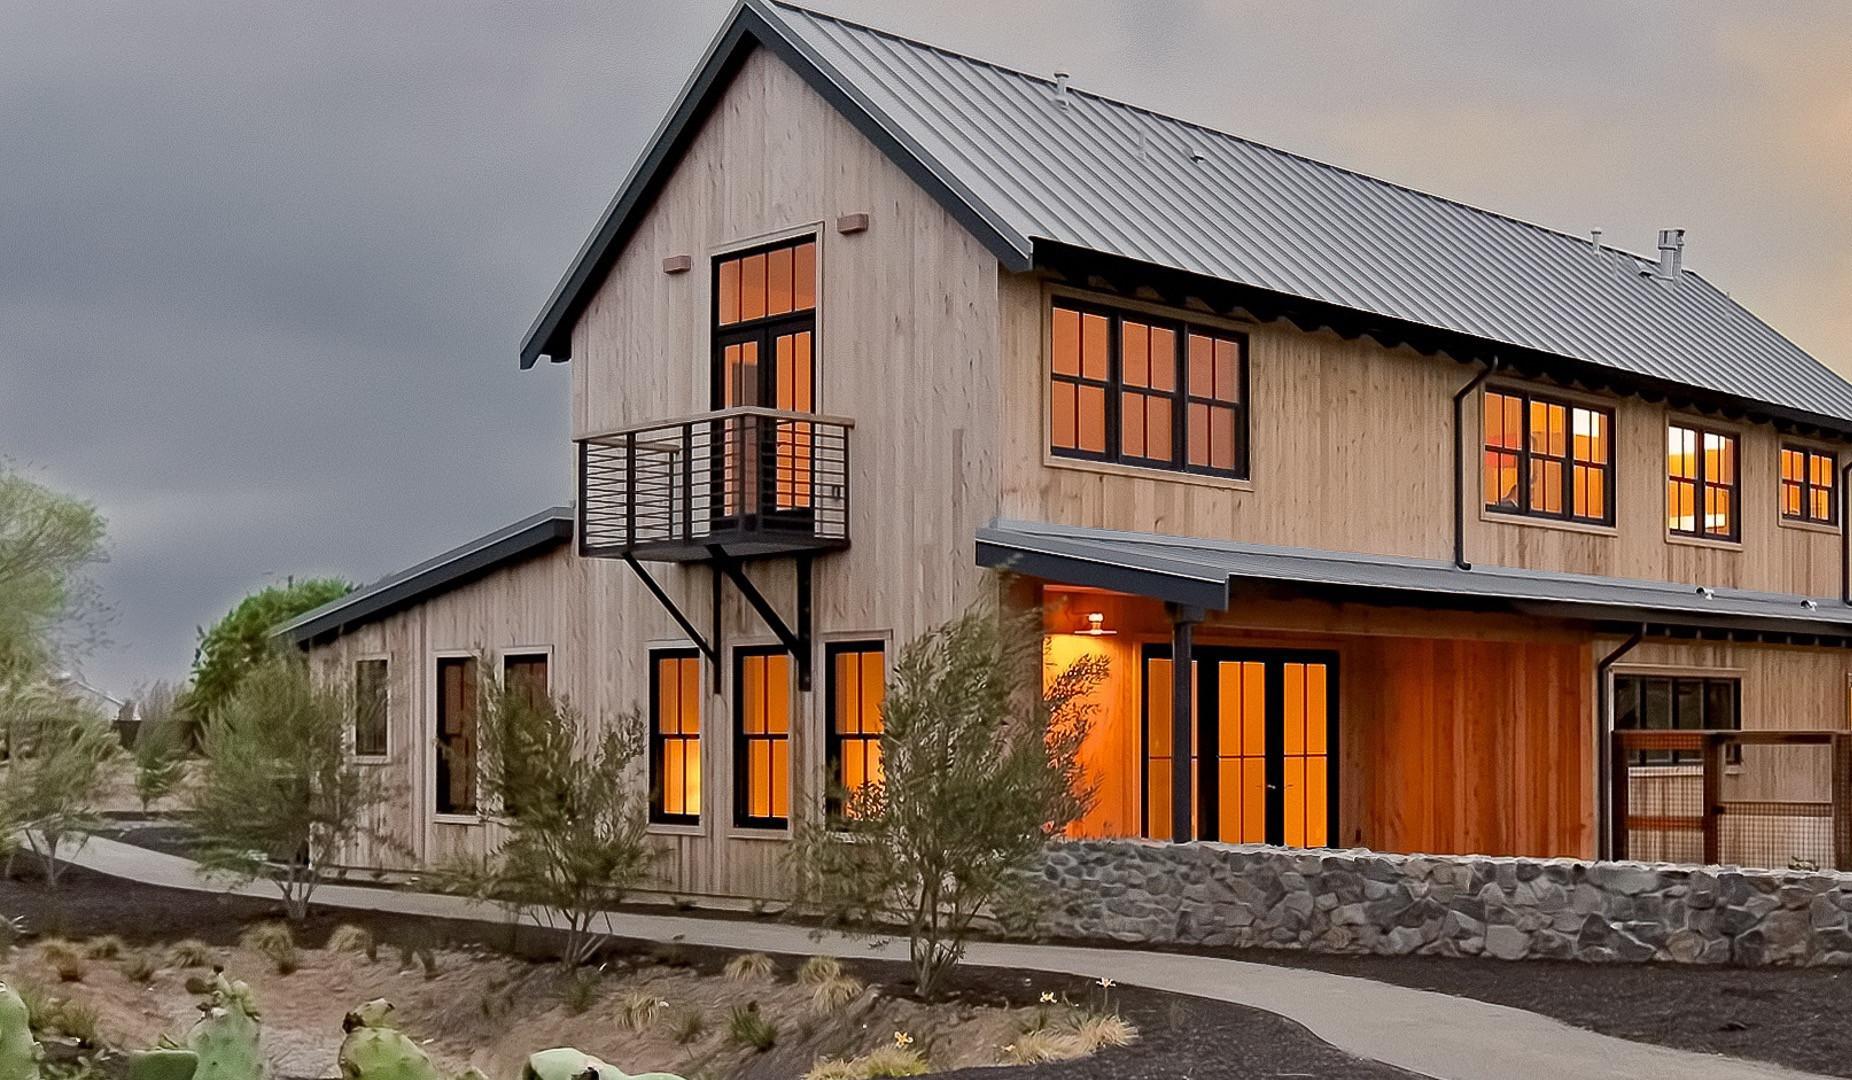 Livermore New Home